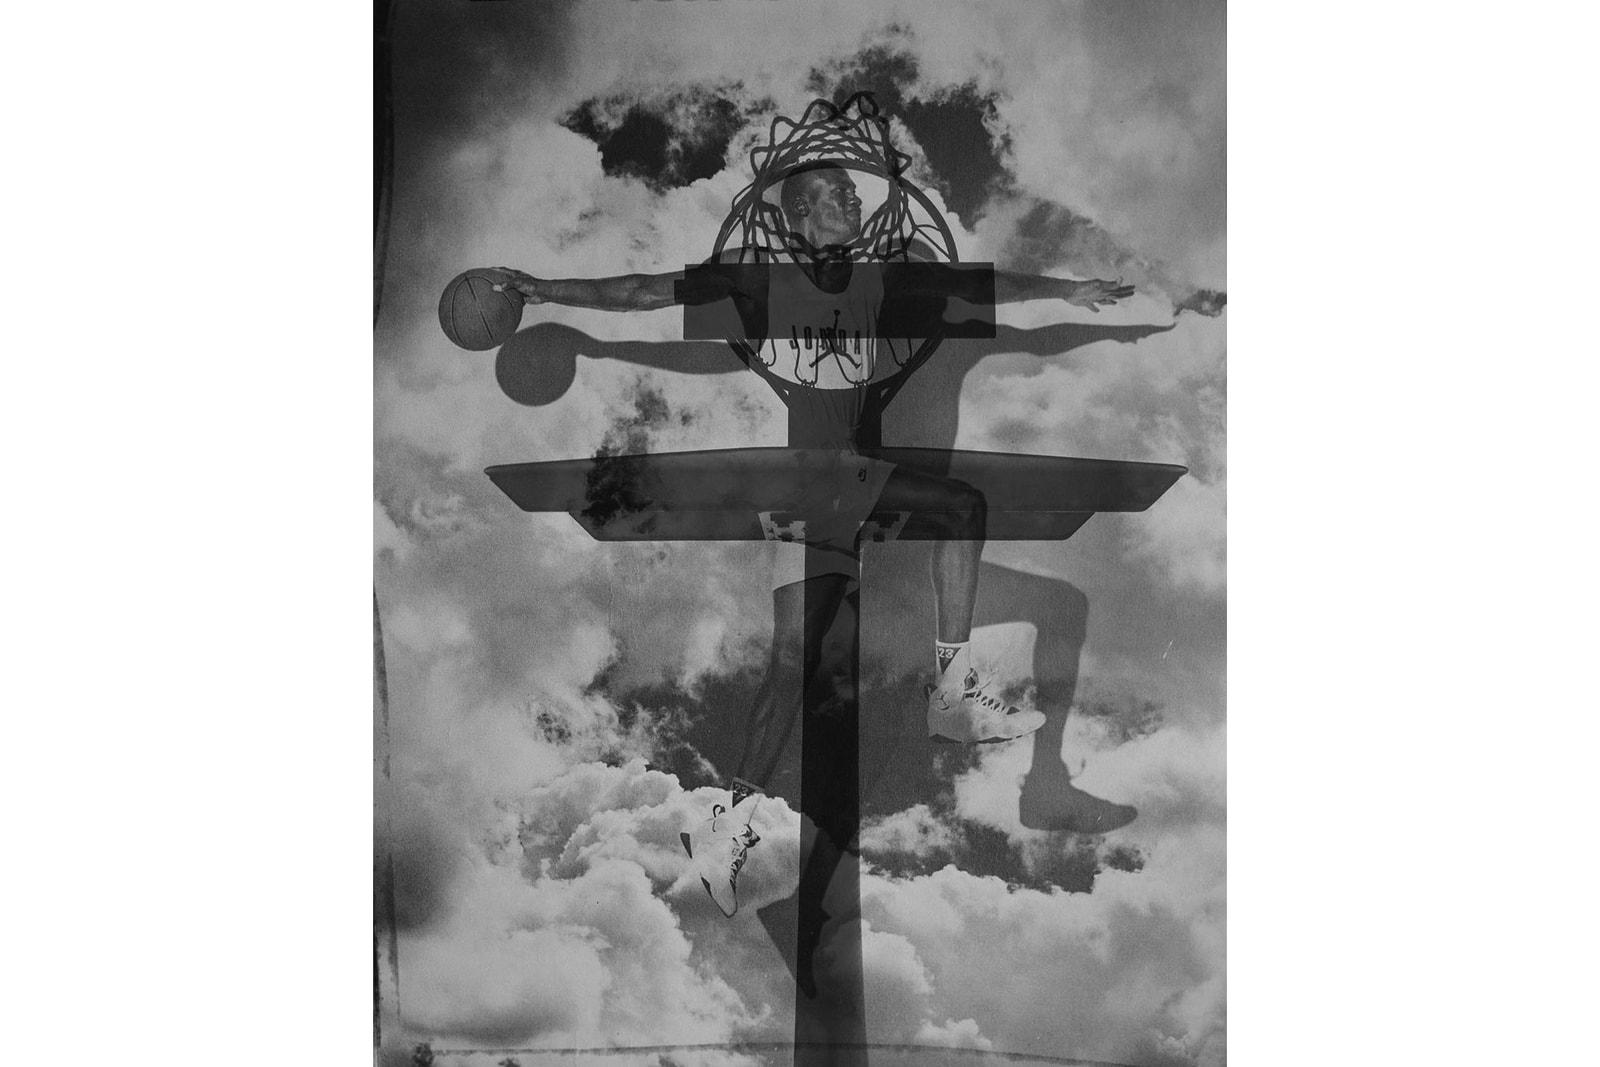 以《The Last Dance》為靈感,籃球藝術雜誌《Franchise》創作 30 張平面作品